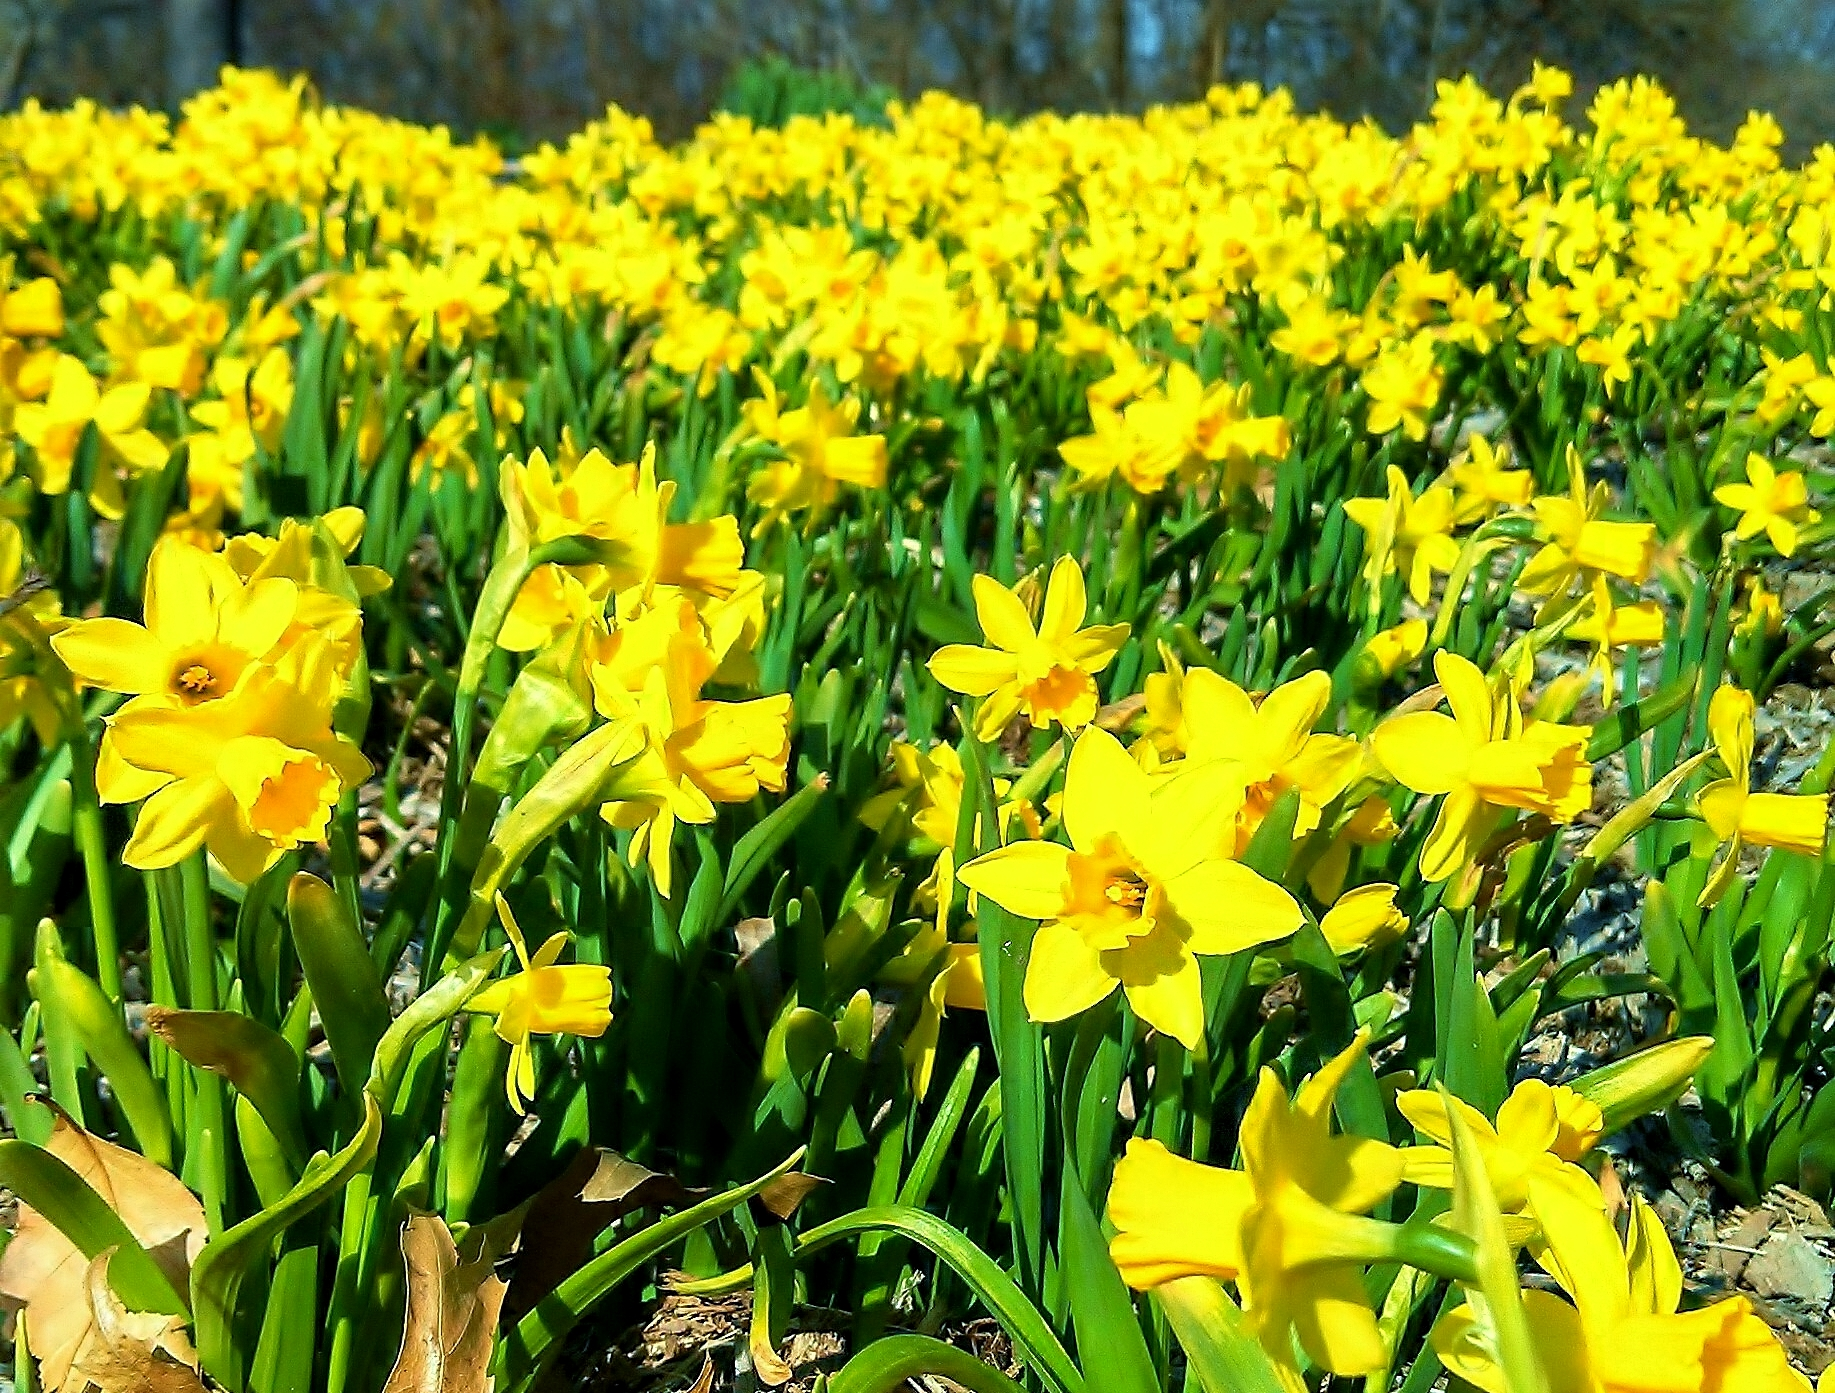 daffodils laughing